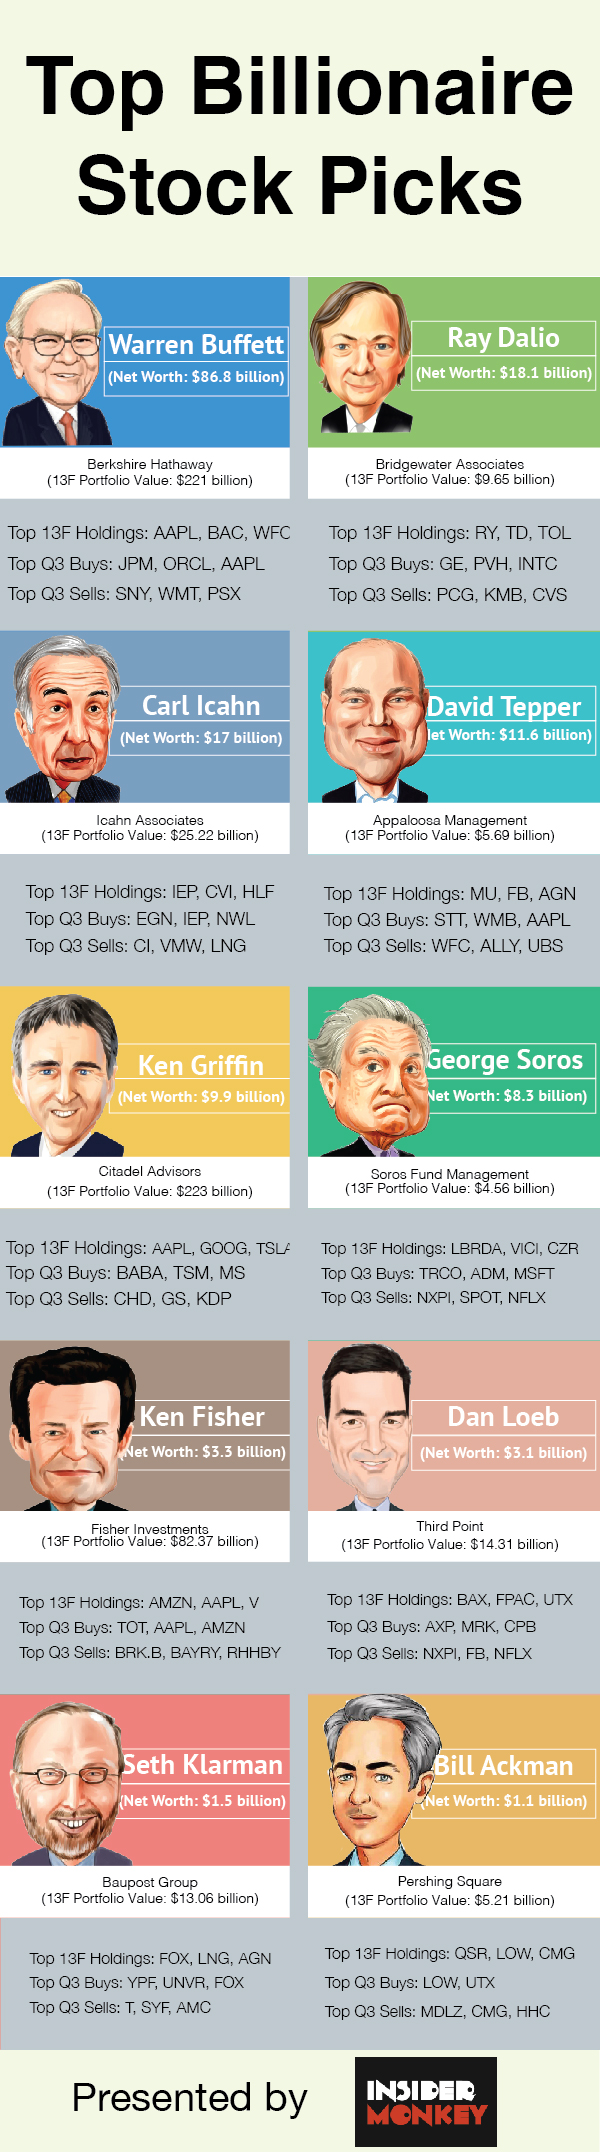 Q3 2018 Hedge Fund Holdings, Returns, Most Popular Stocks